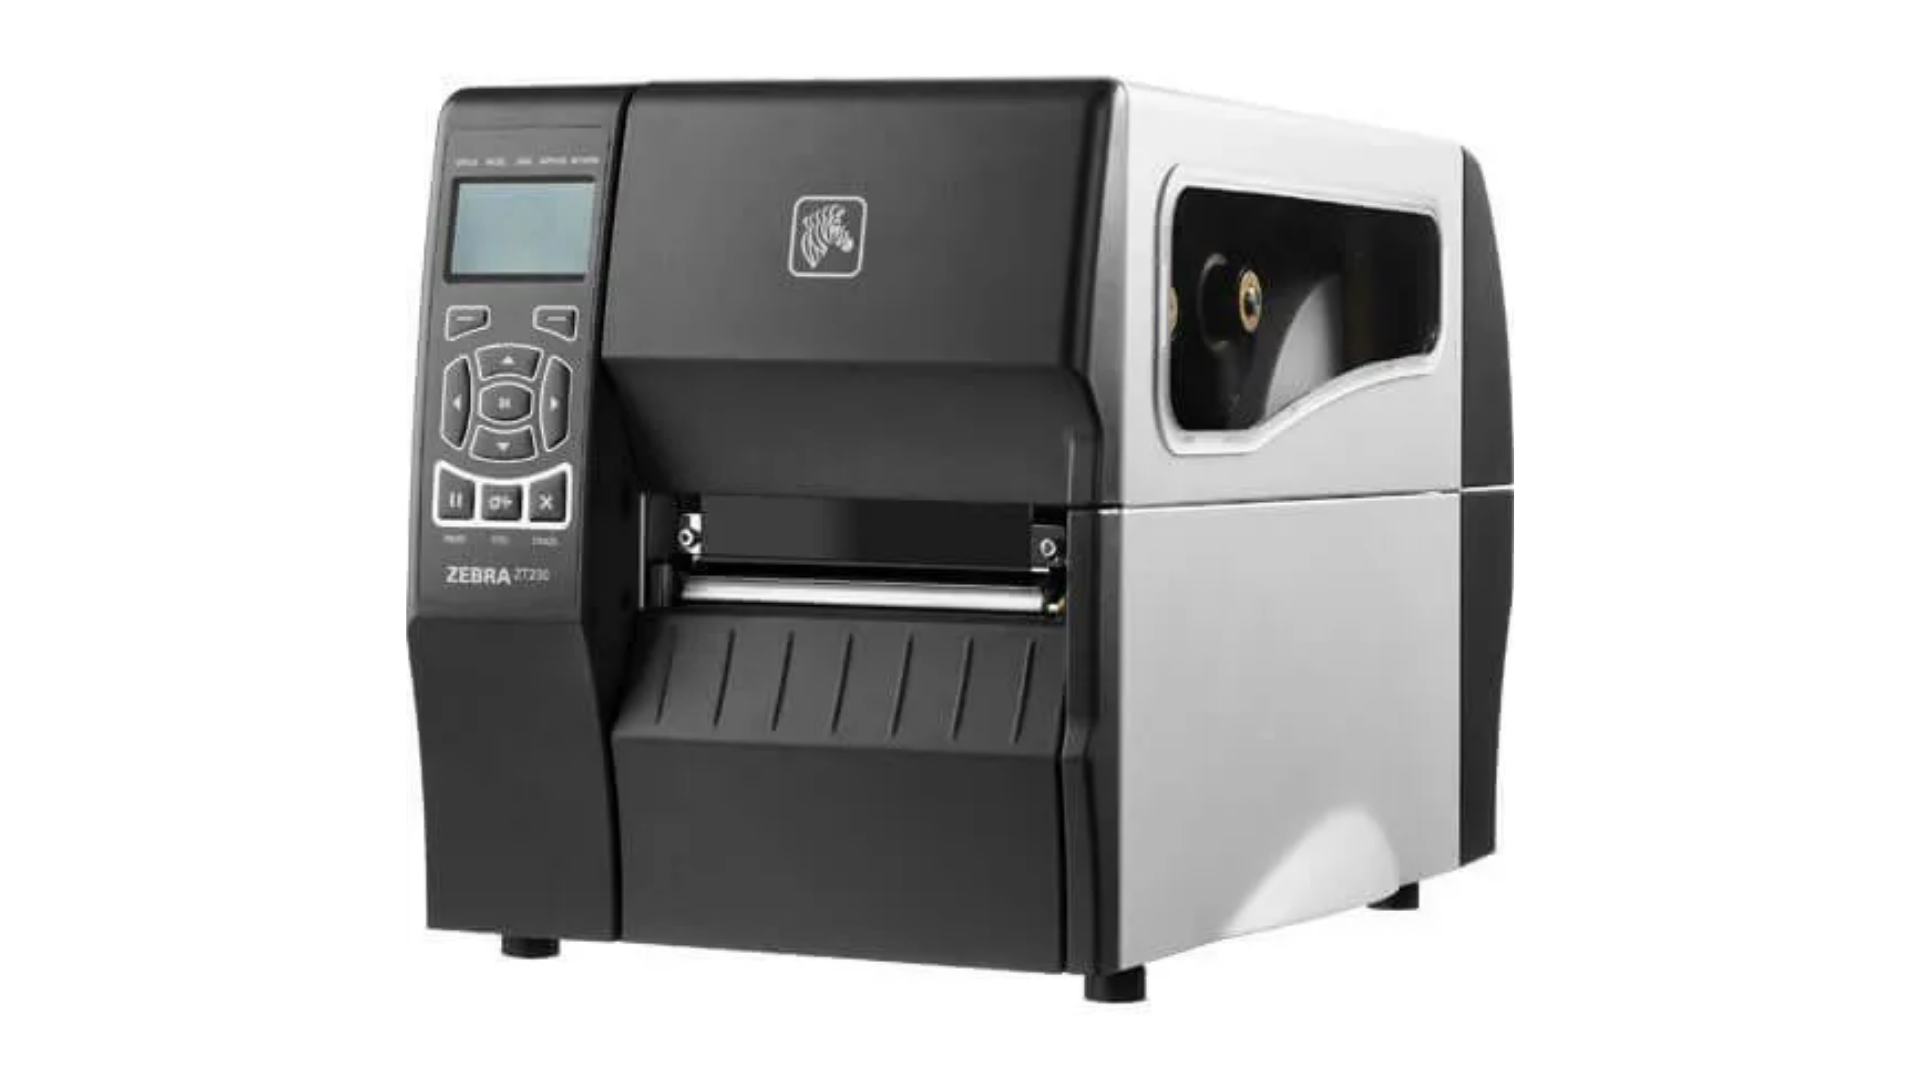 Impressora térmica industrial Zebra ZT230 em fundo branco.